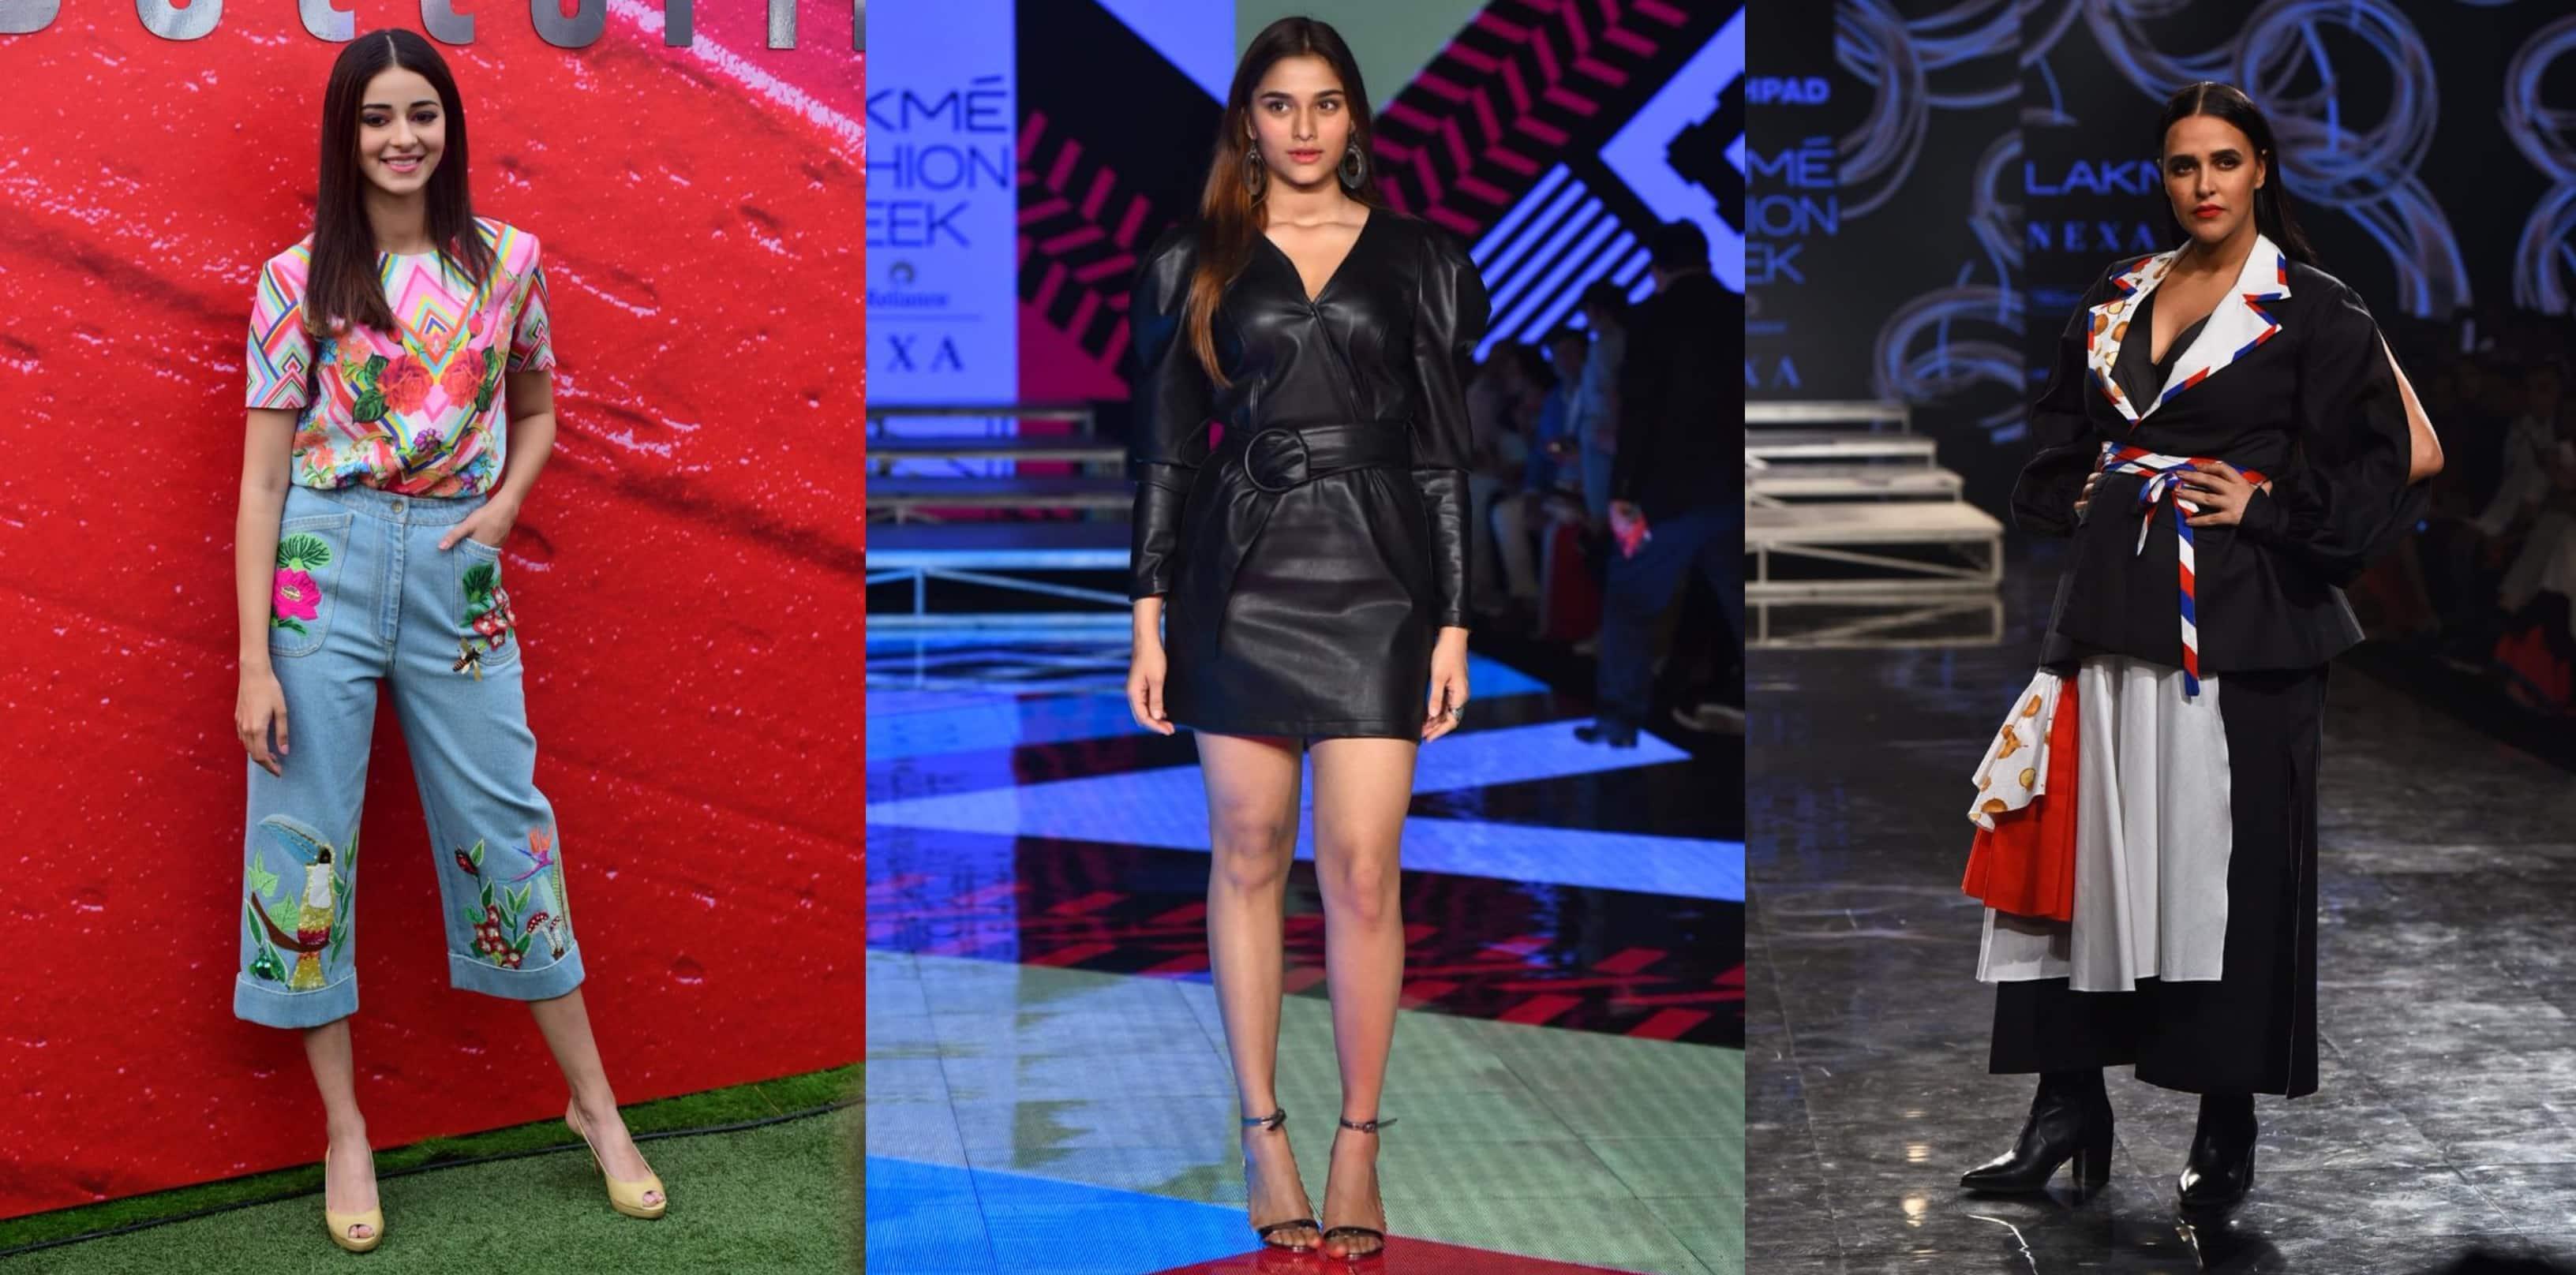 Spotted: Ananya Panday Goes Glam, Saiee Manjrekar Walks The Ramp At LFW 2020